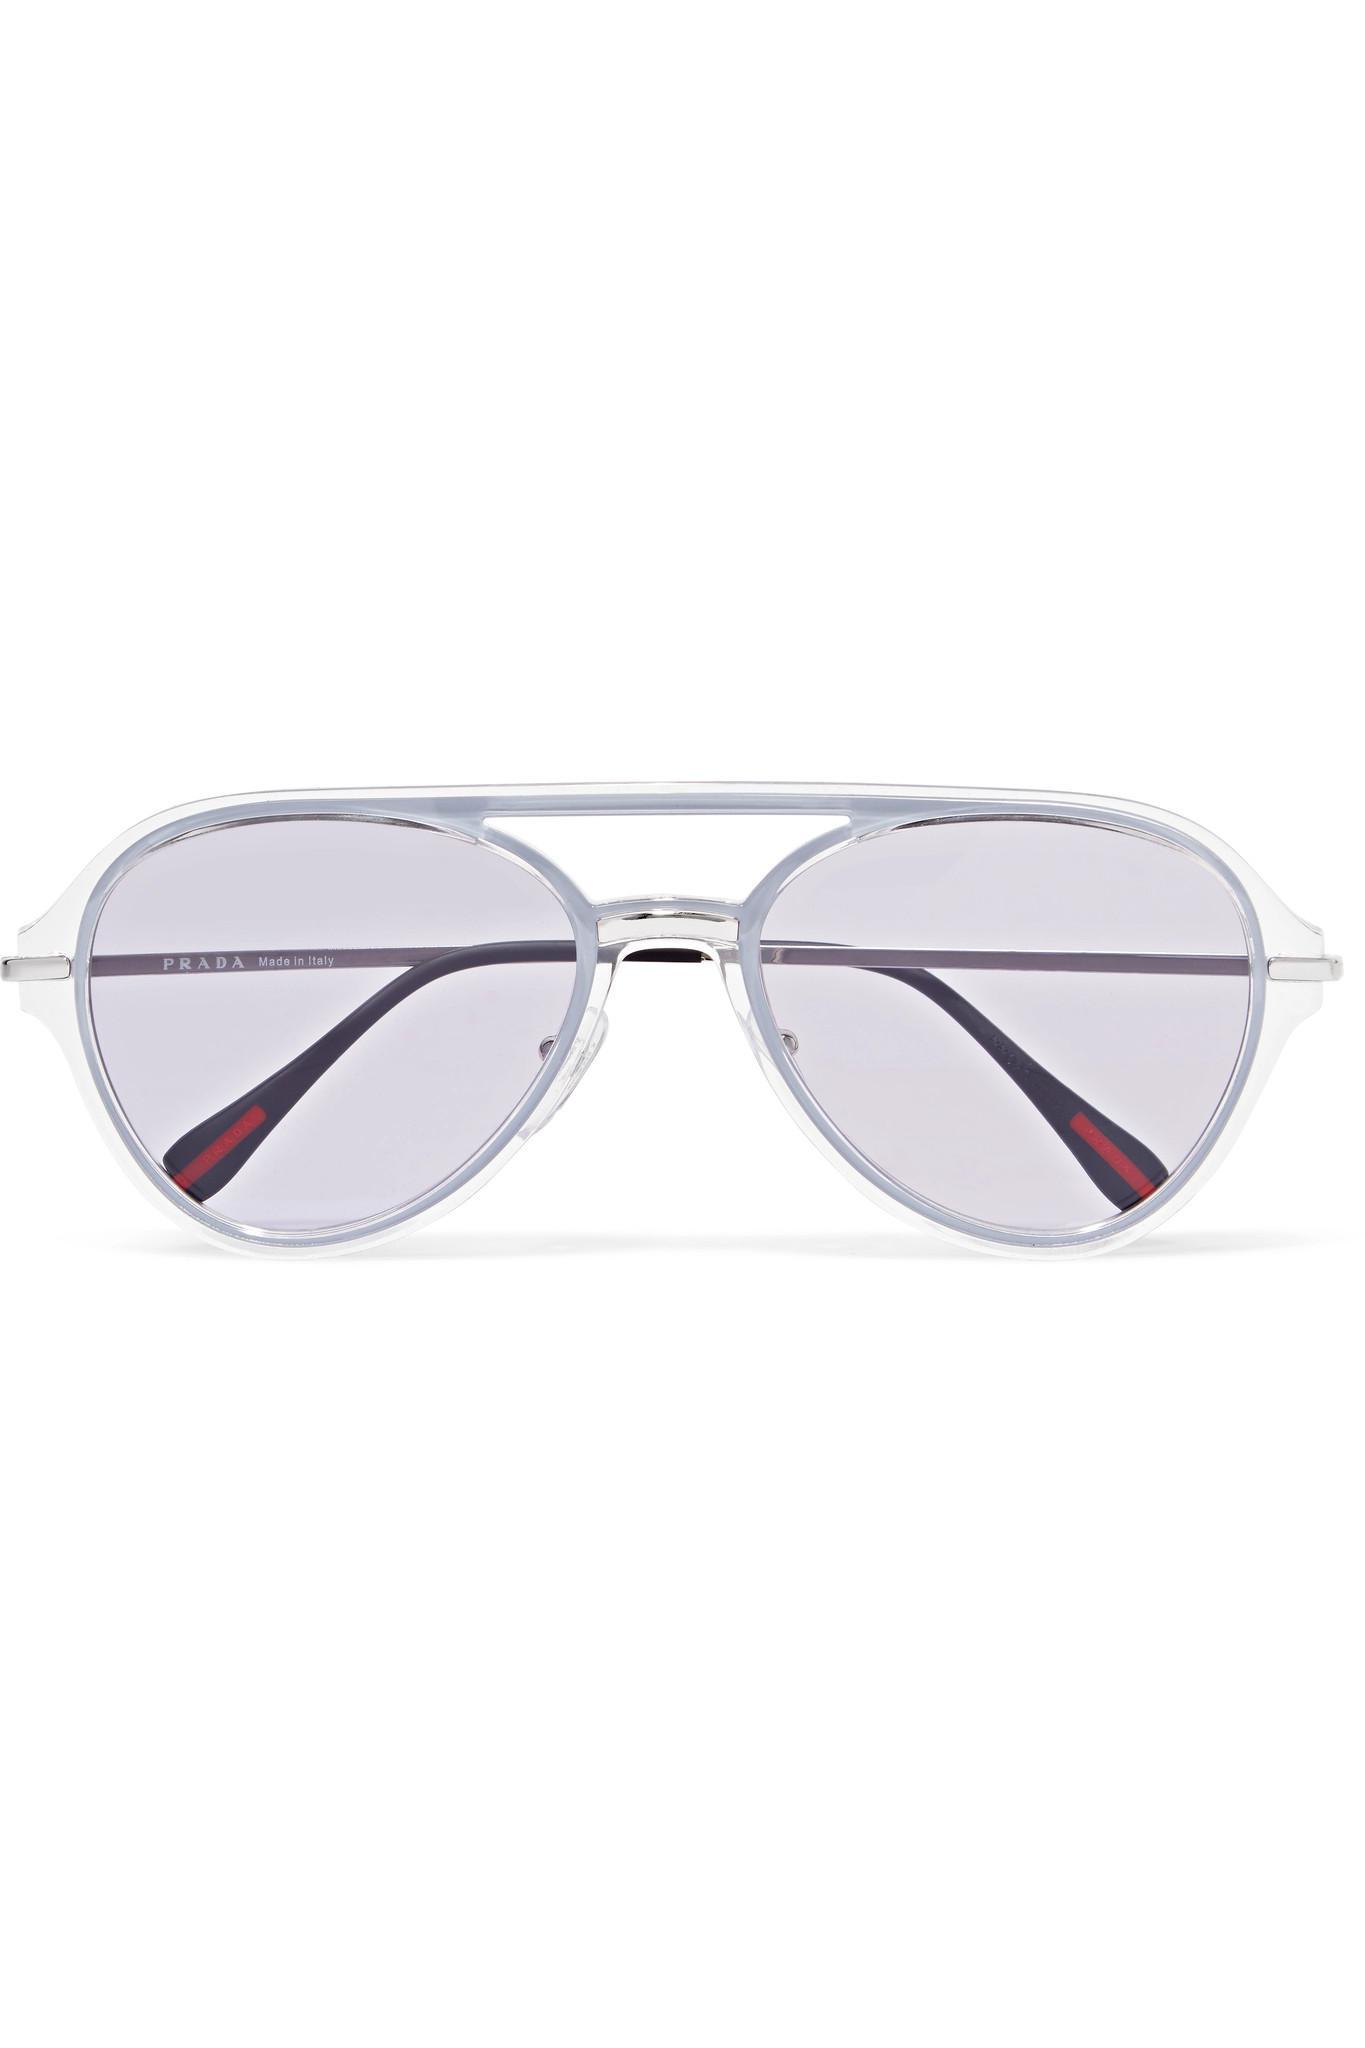 5878c920e352 Lyst And Tone Style In Silver Acetate Purple Aviator Prada Sunglasses  ngzqRIn